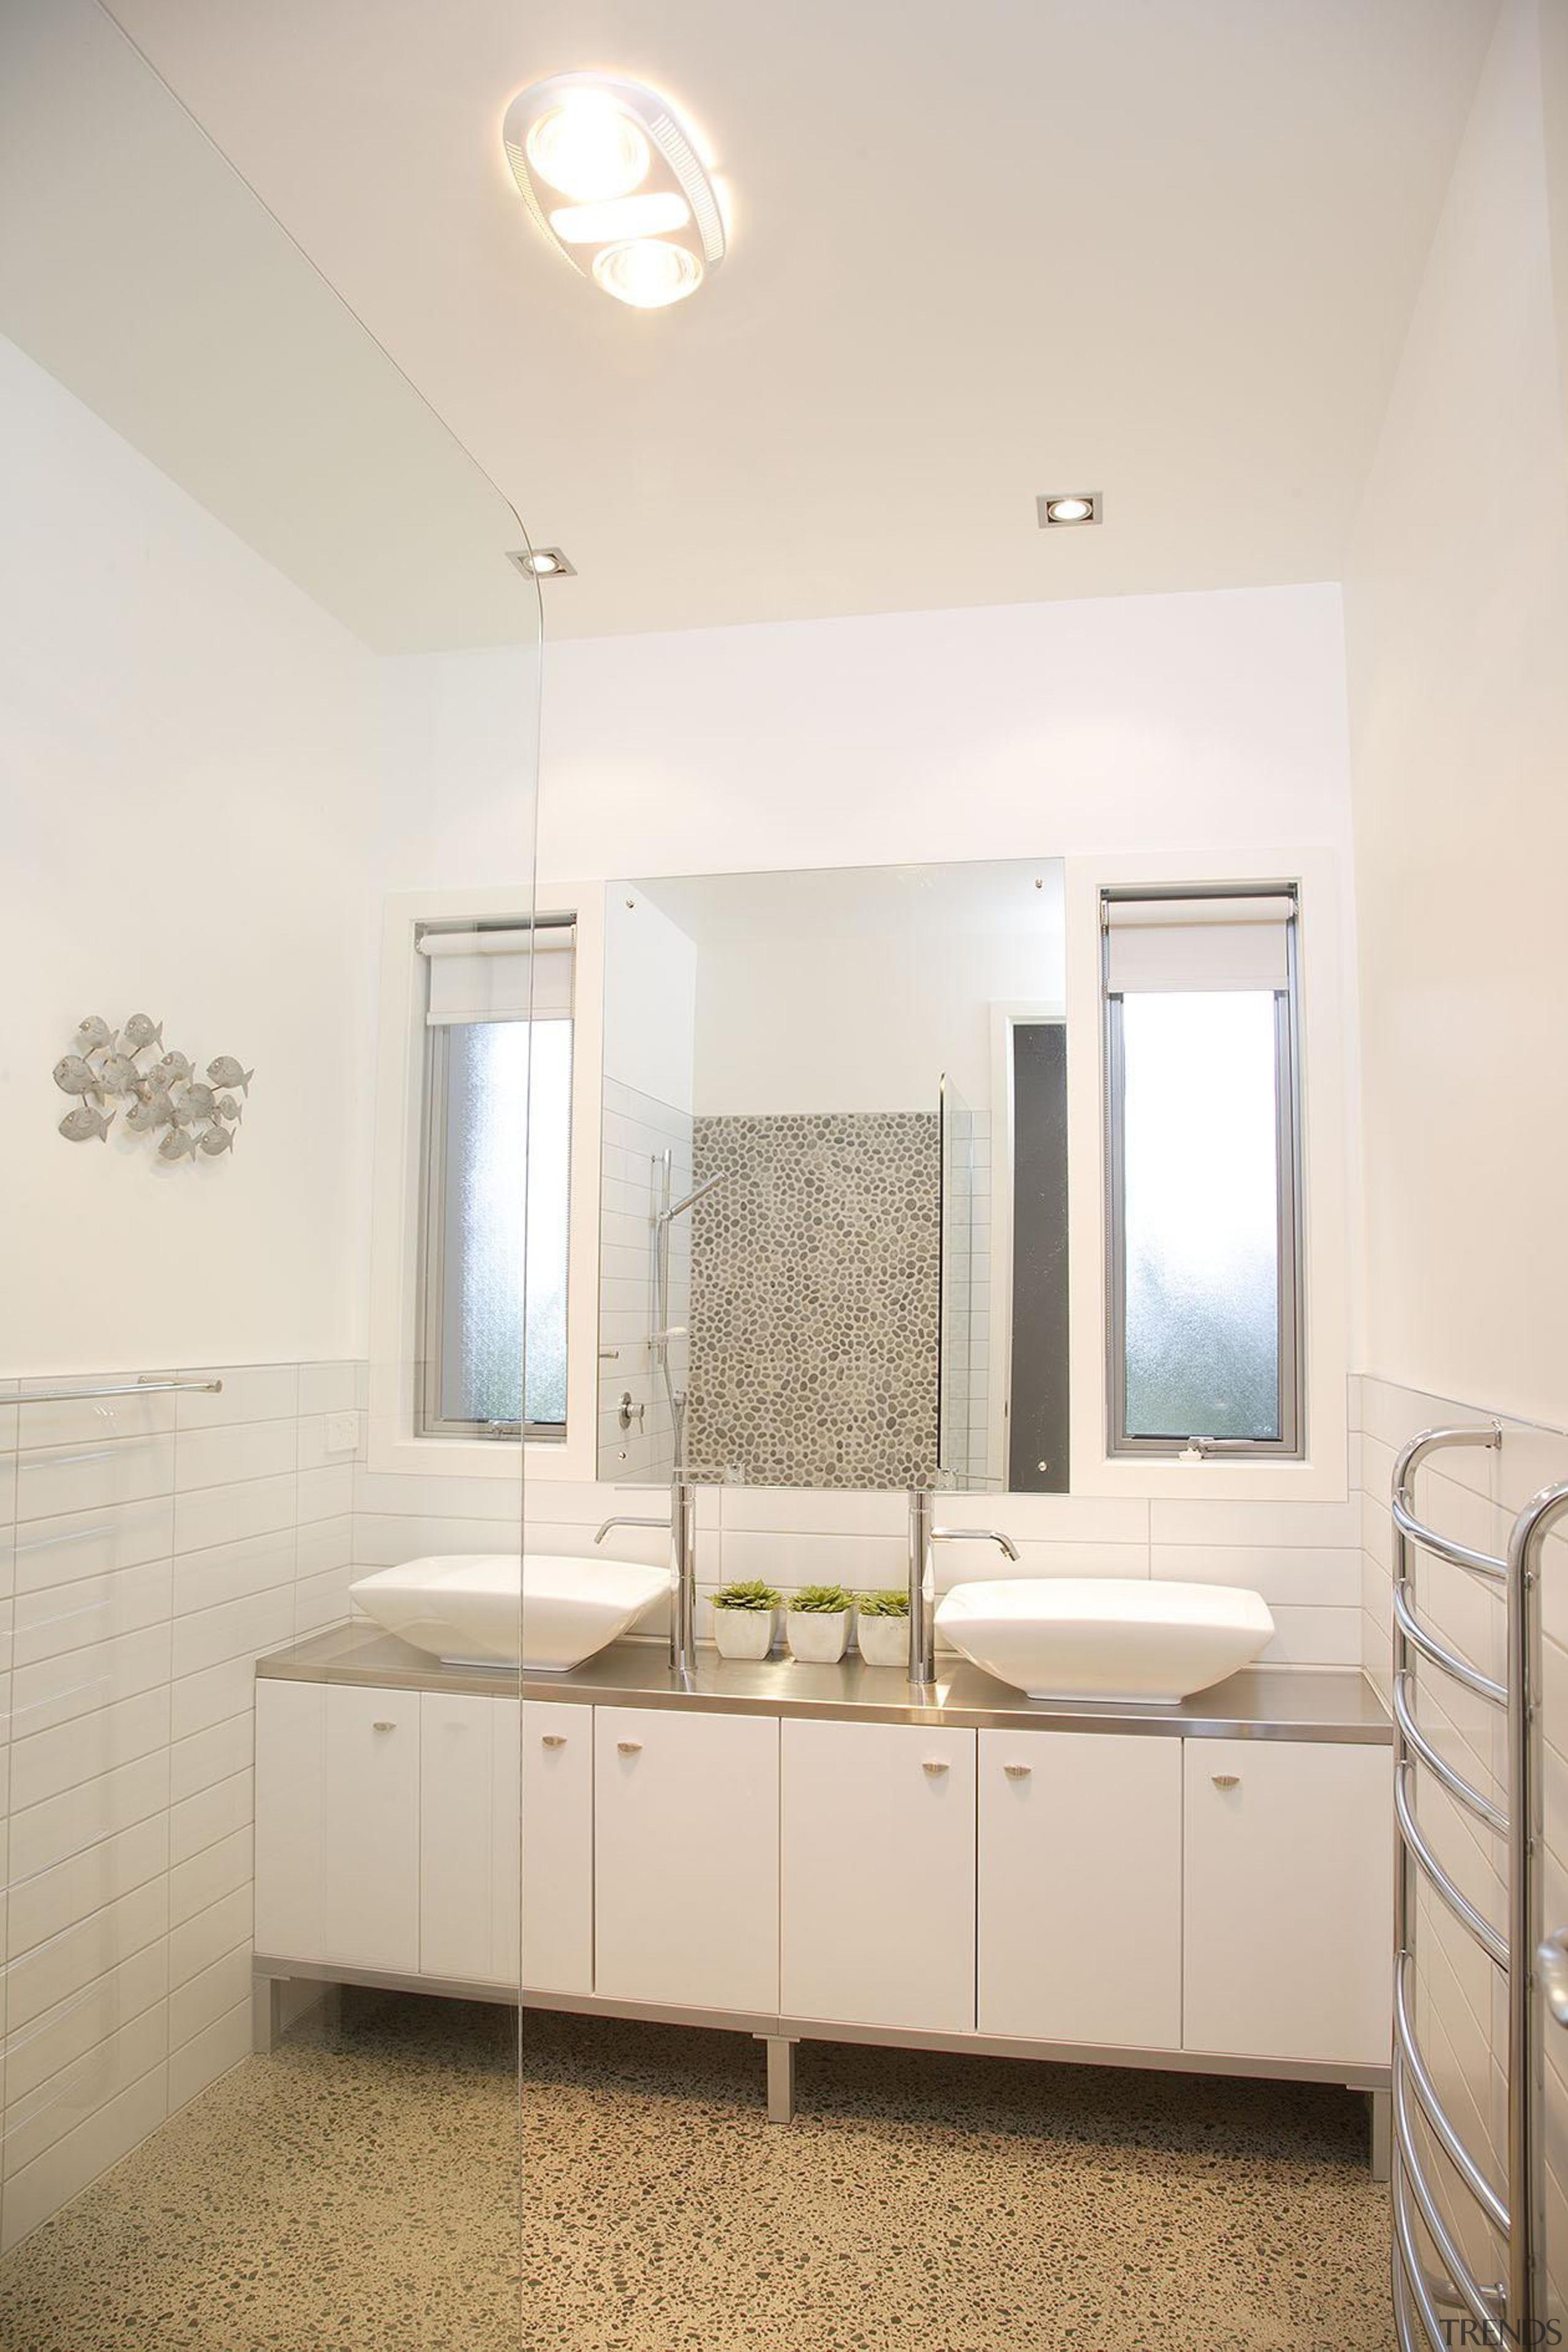 For more information, please visit www.gjgardner.co.nz bathroom, ceiling, daylighting, floor, home, interior design, real estate, room, sink, white